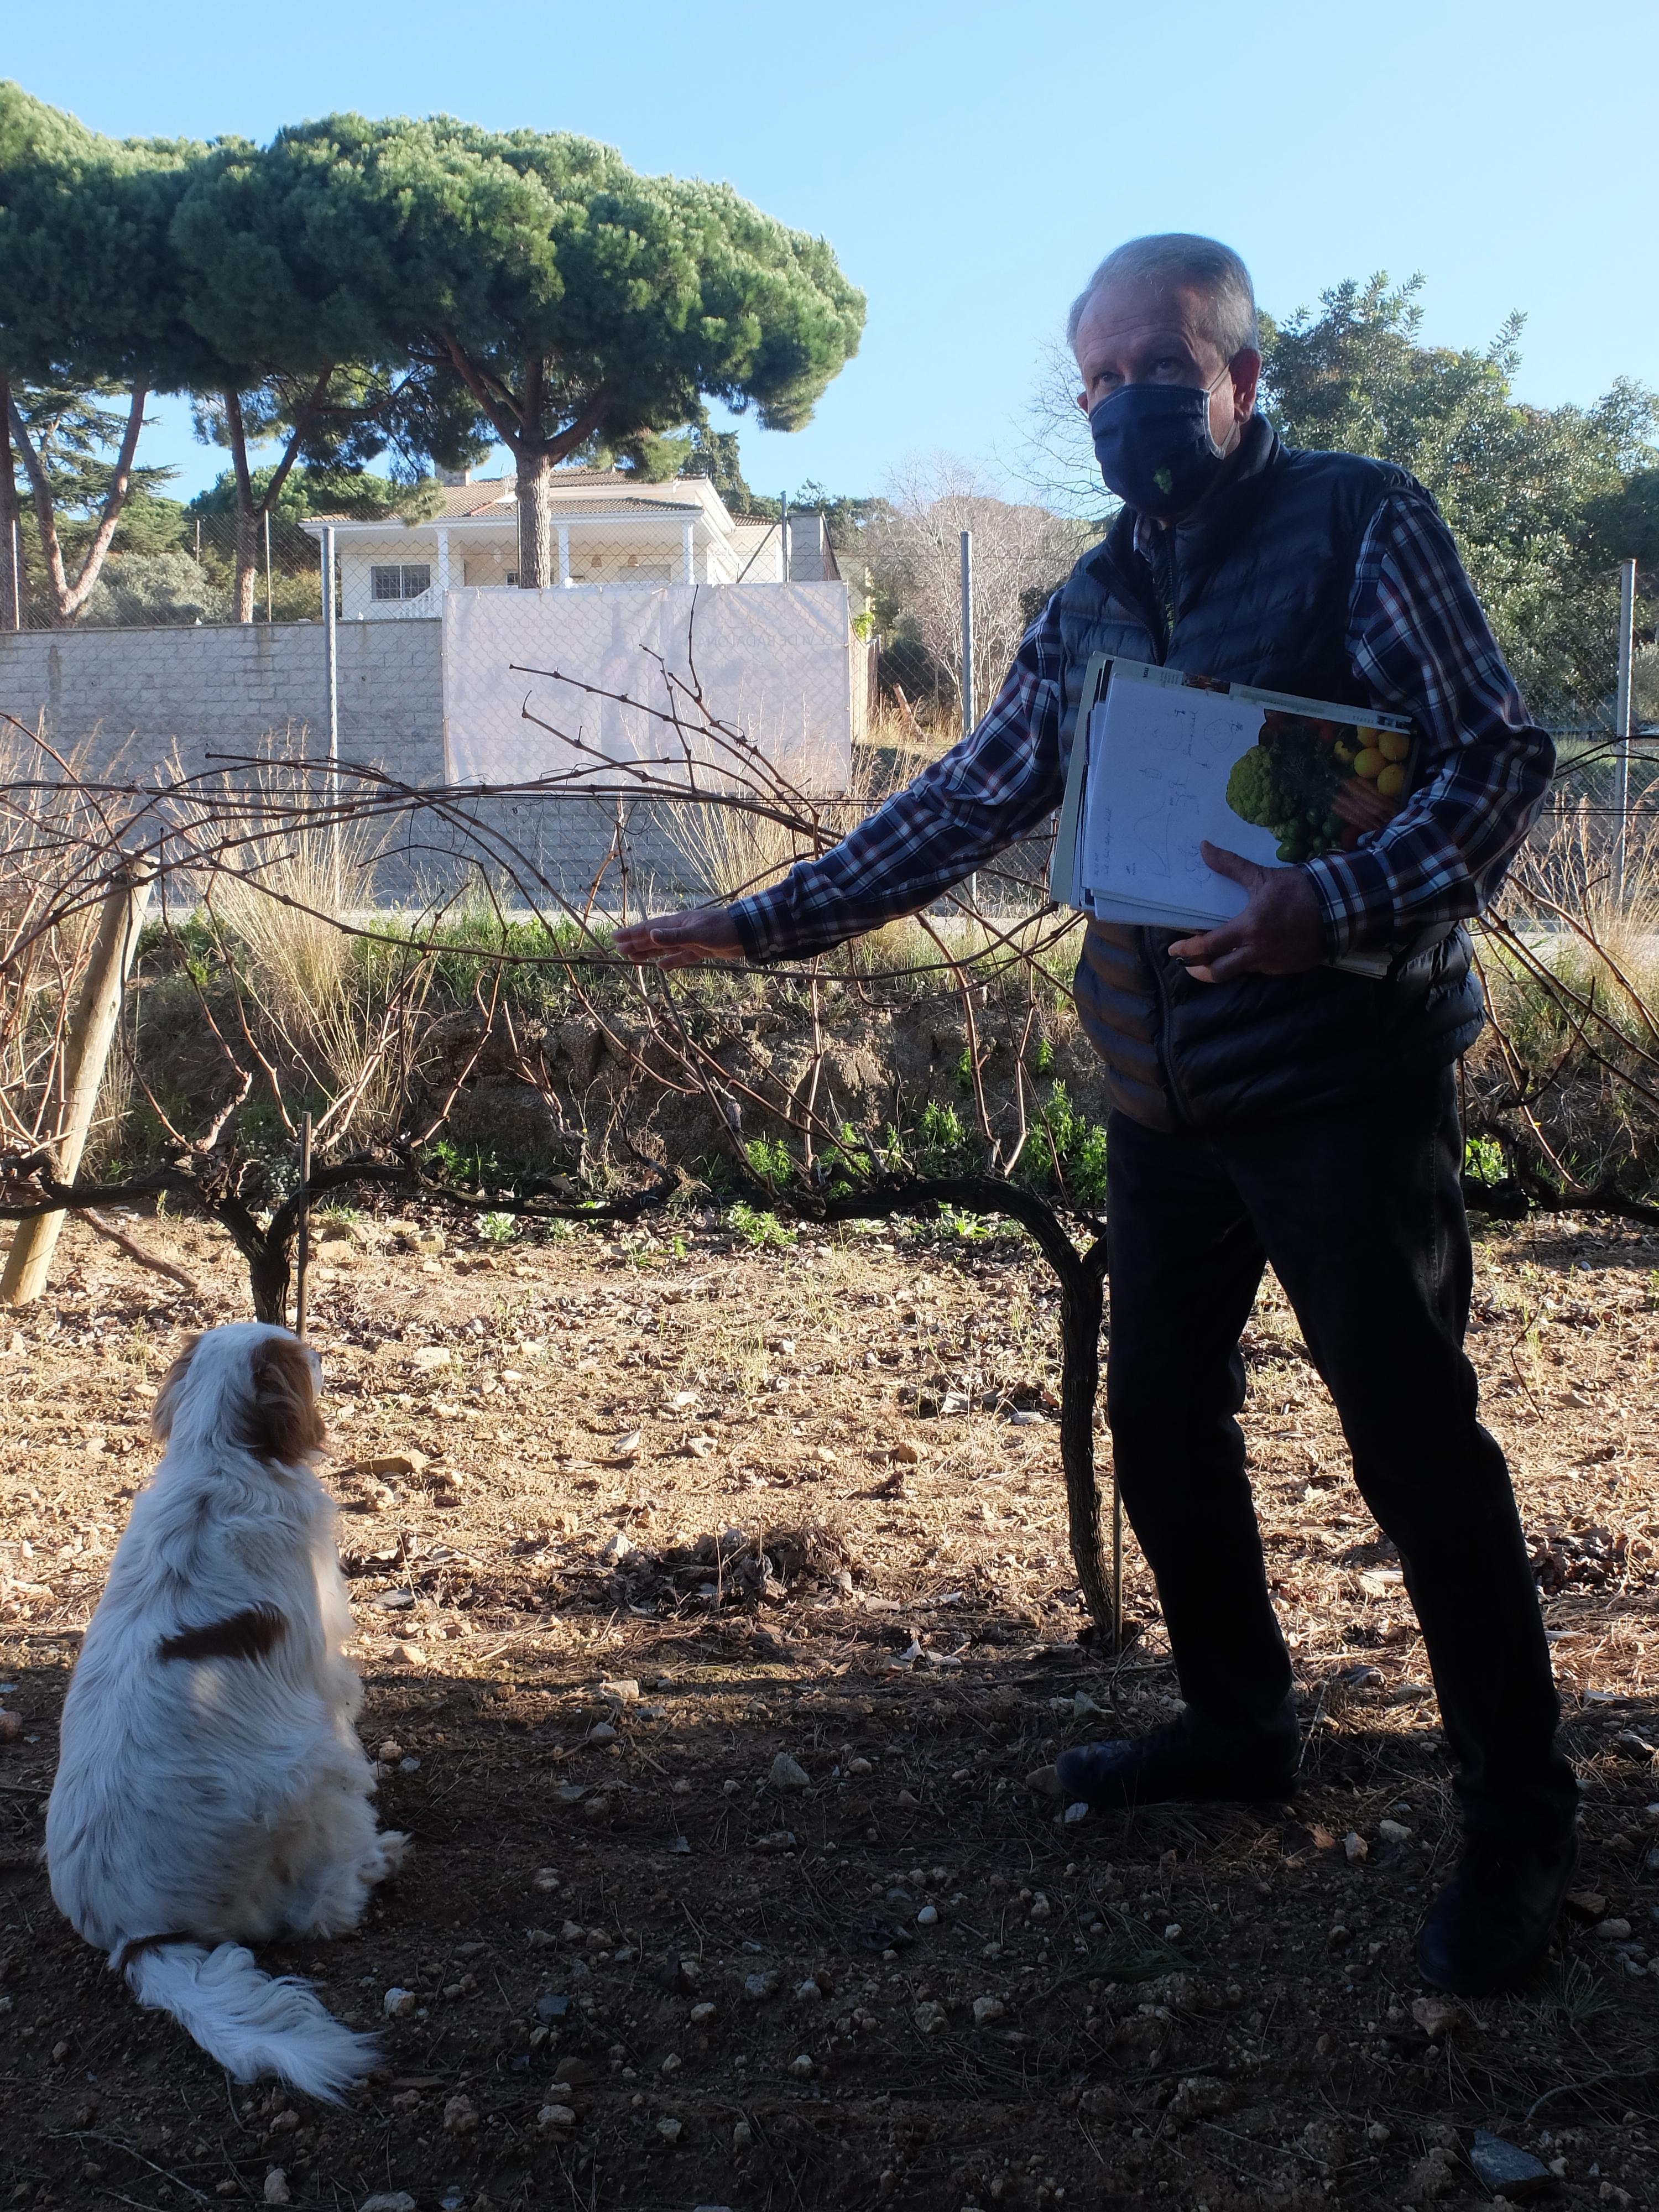 Josep Coll acompañado por Brisa, Masia Coll - Canyet (Badalona)